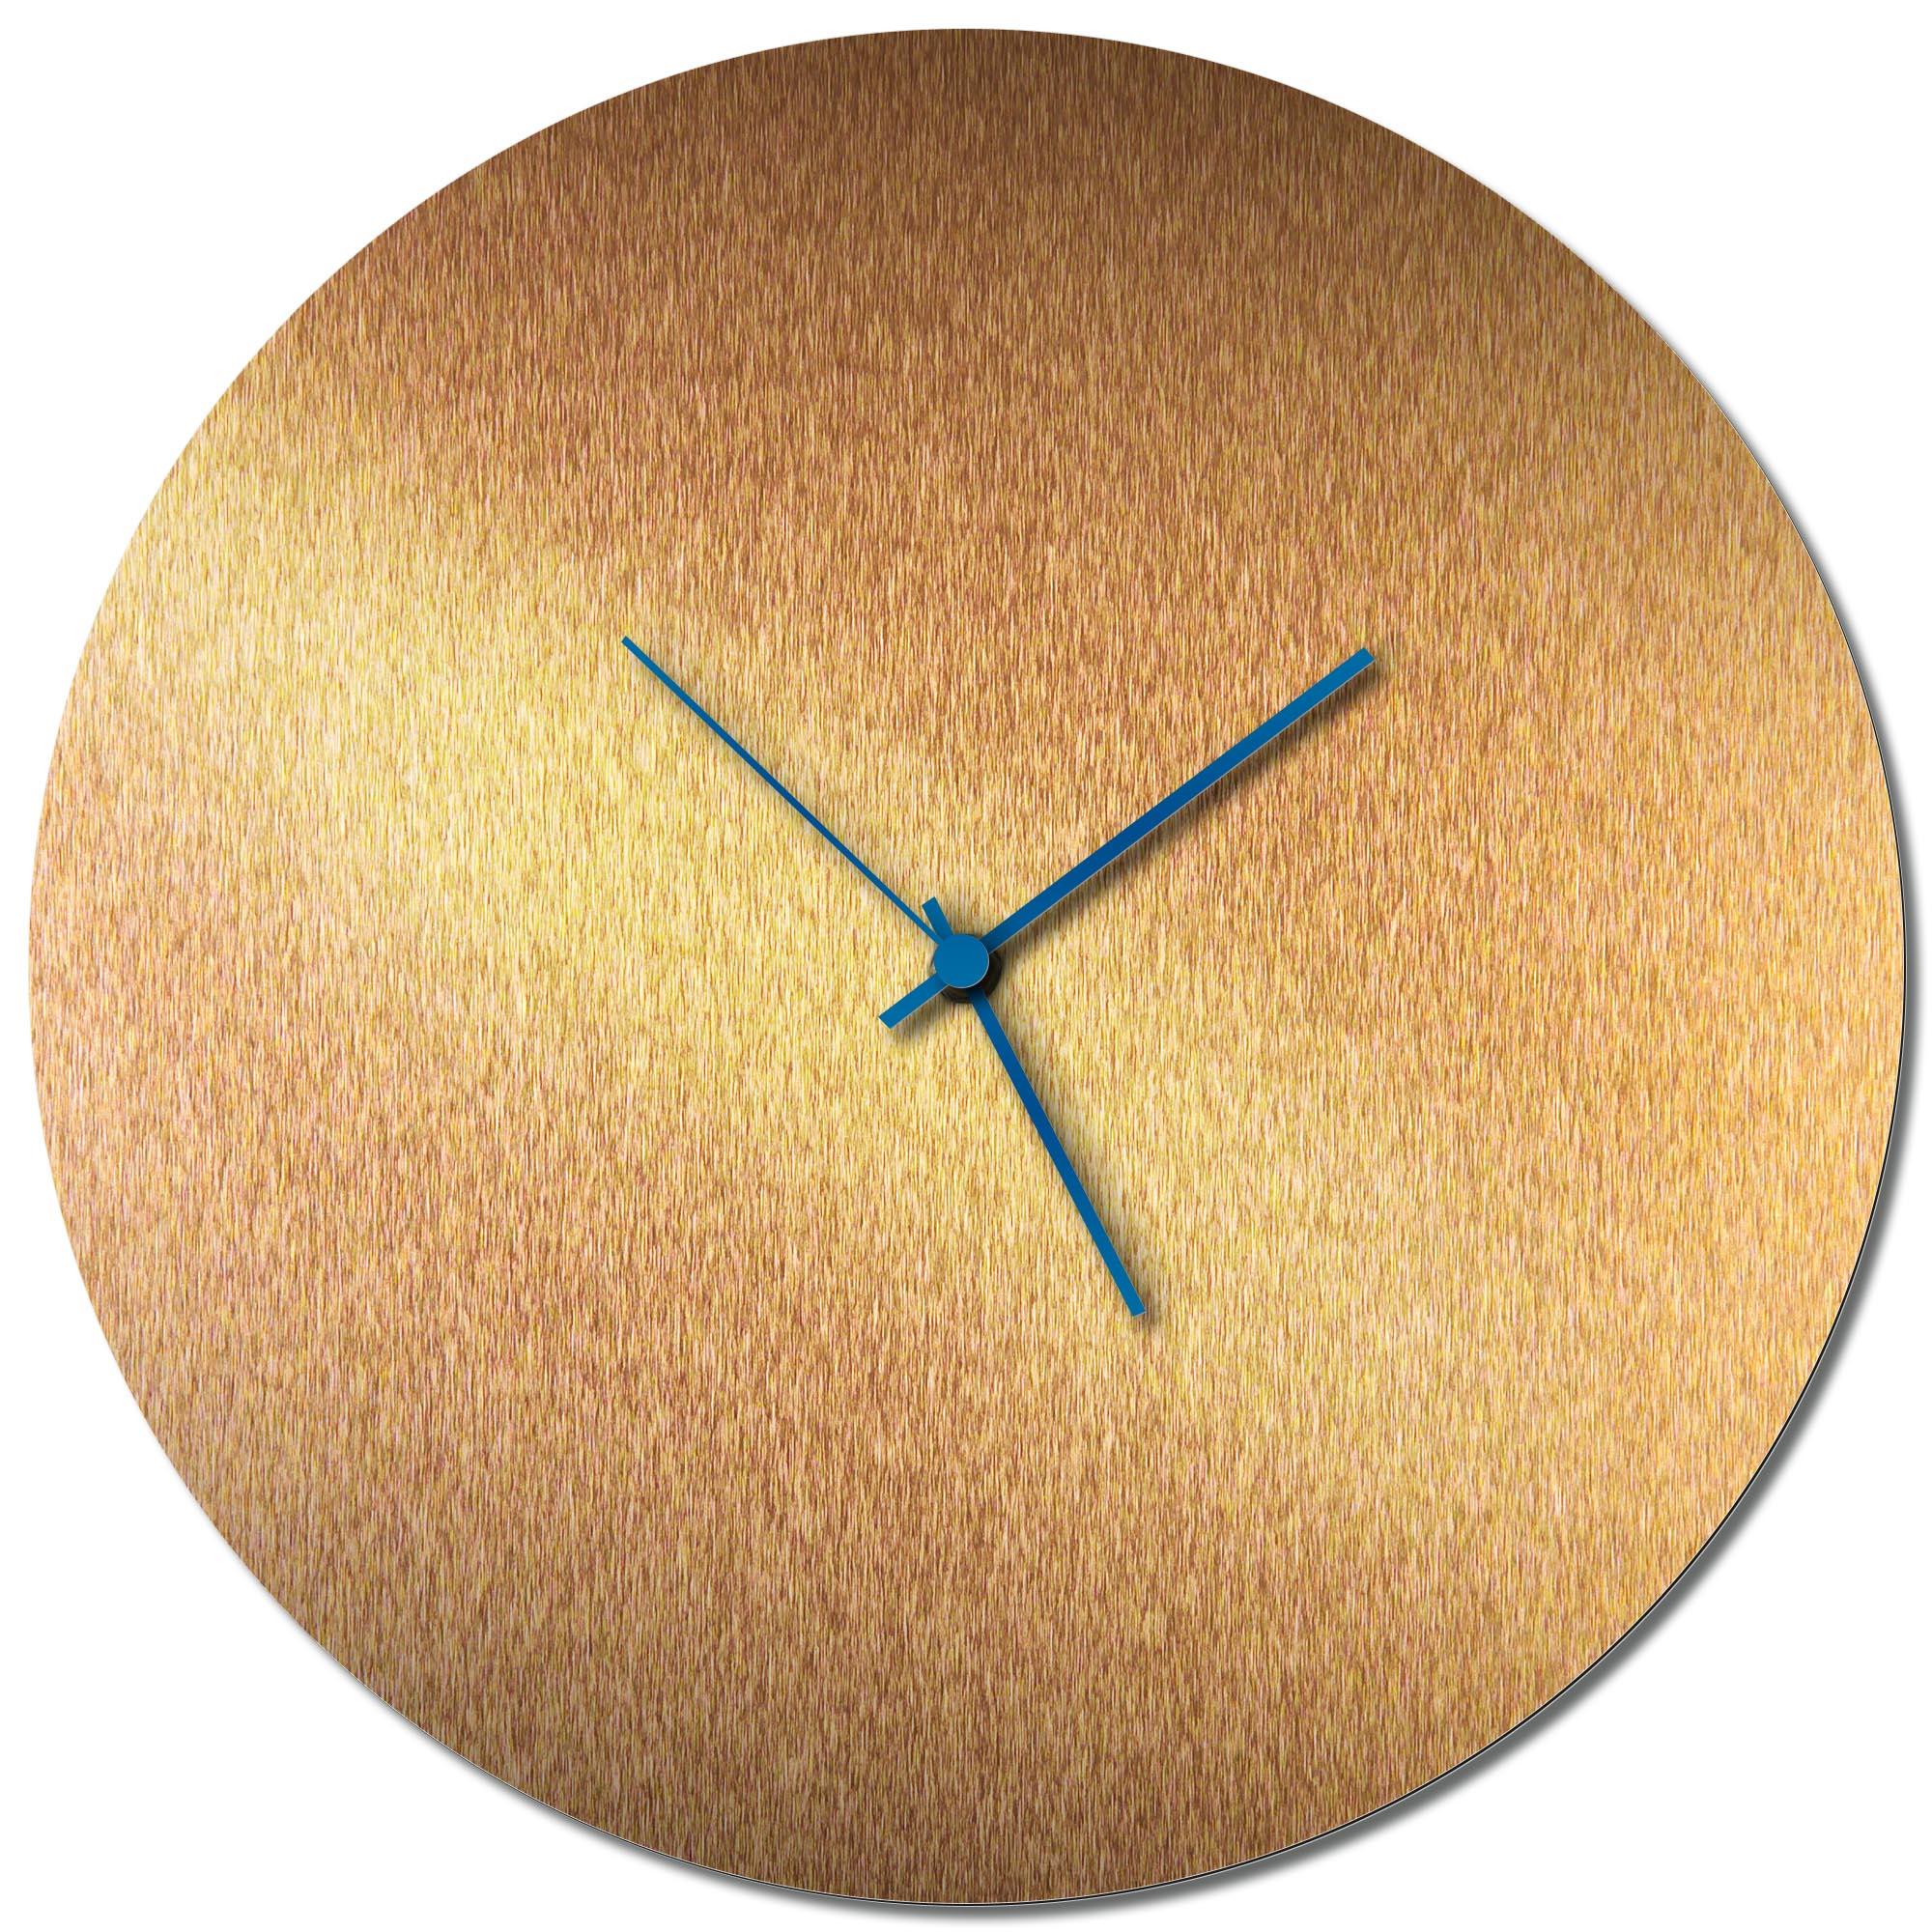 Adam Schwoeppe 'Bronzesmith Circle Clock Blue' Midcentury Modern Style Wall Clock